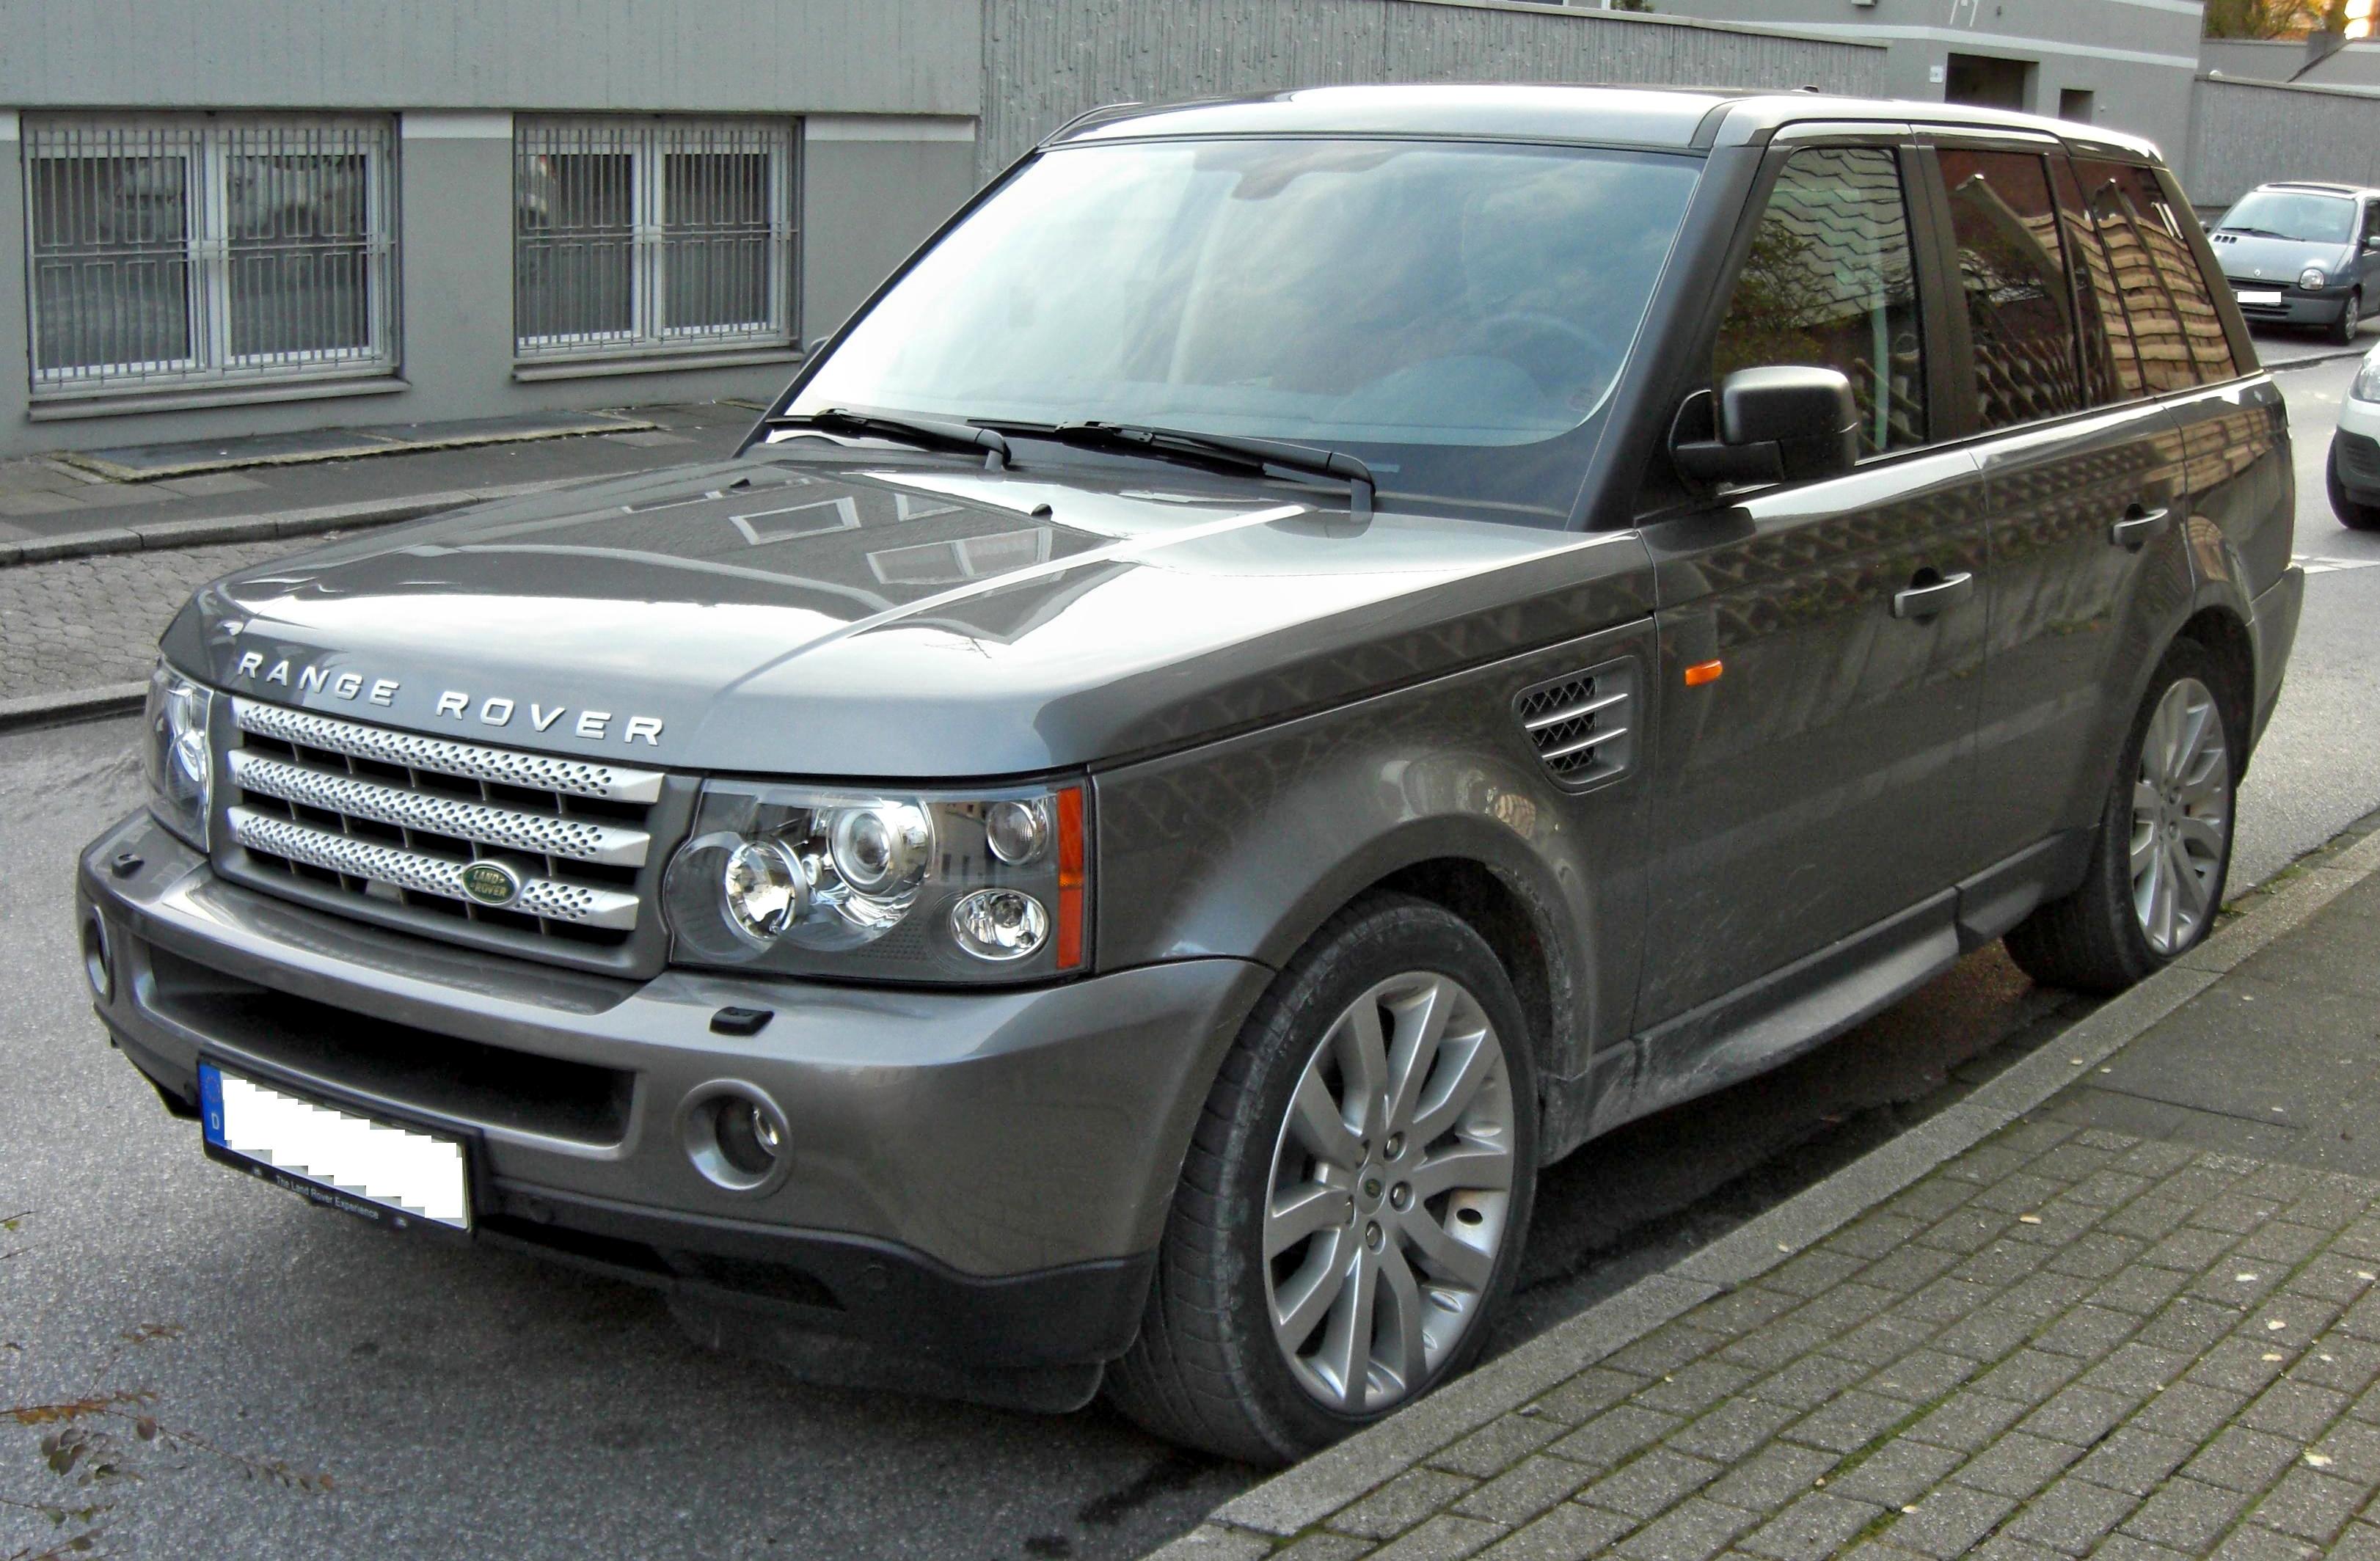 Range Rover Sport Wikipedia >> Range Rover Sport Wikipedia | Upcomingcarshq.com